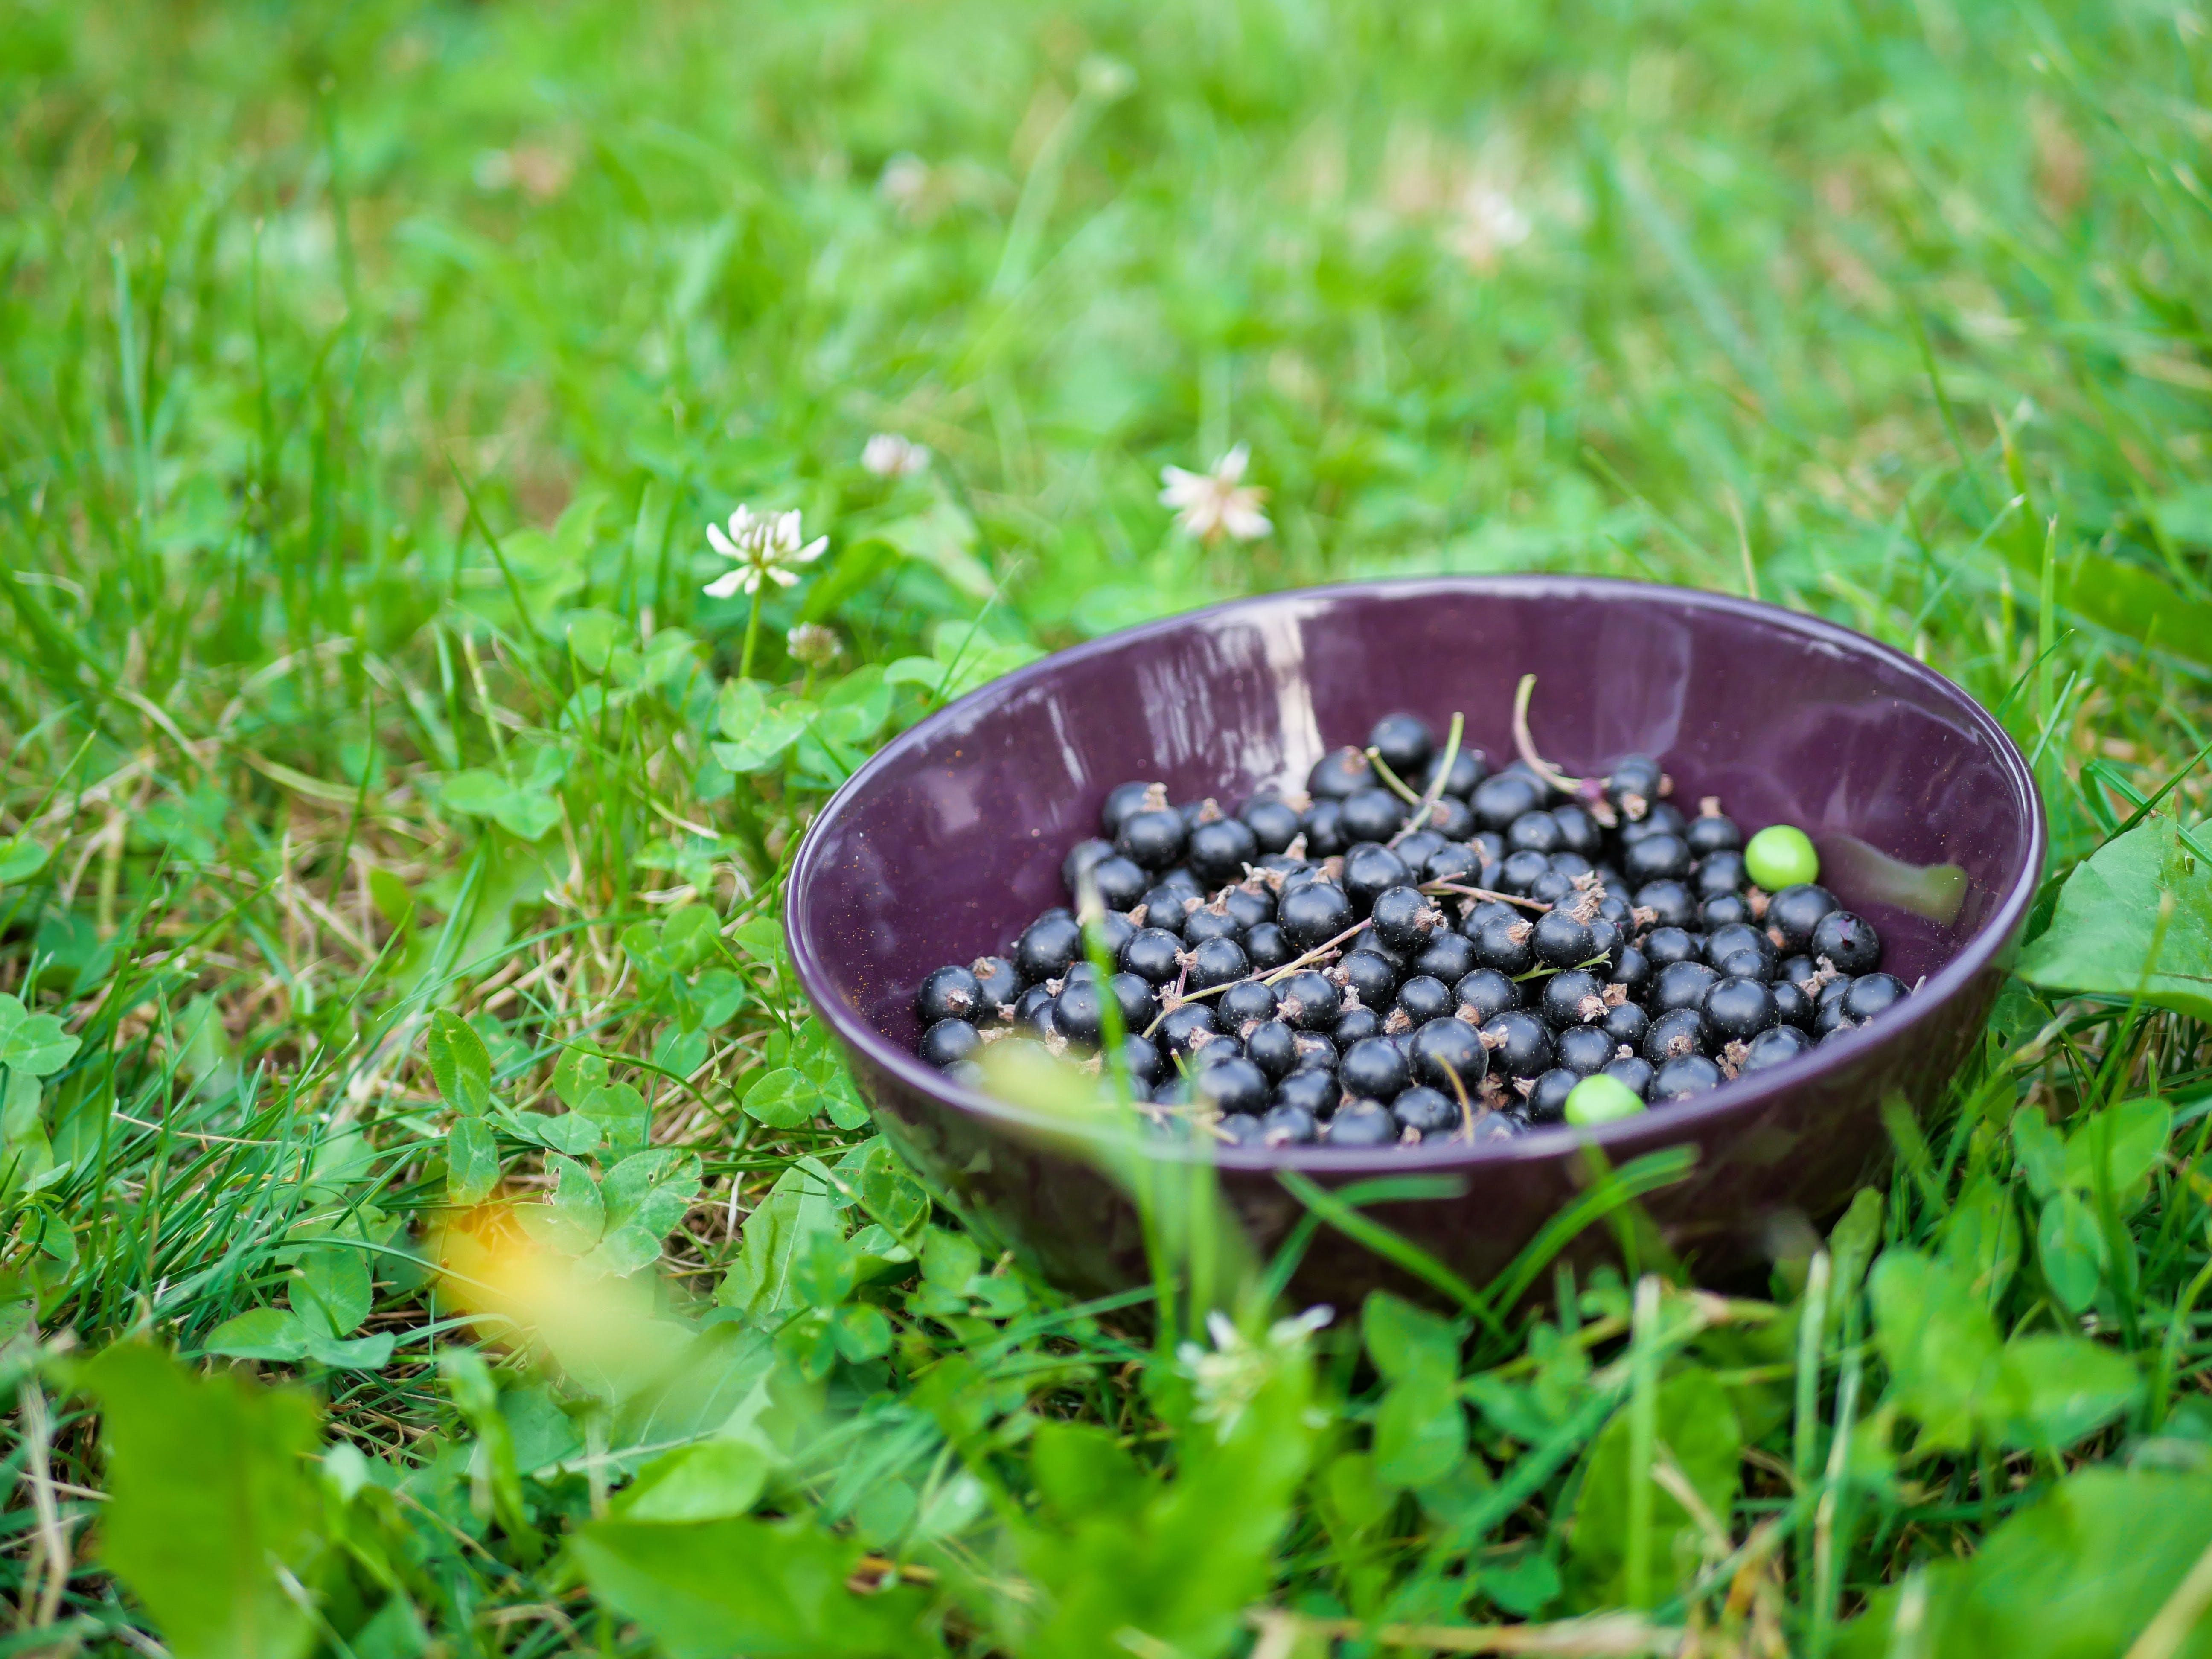 Free stock photo of grass, green, bowl, fruit